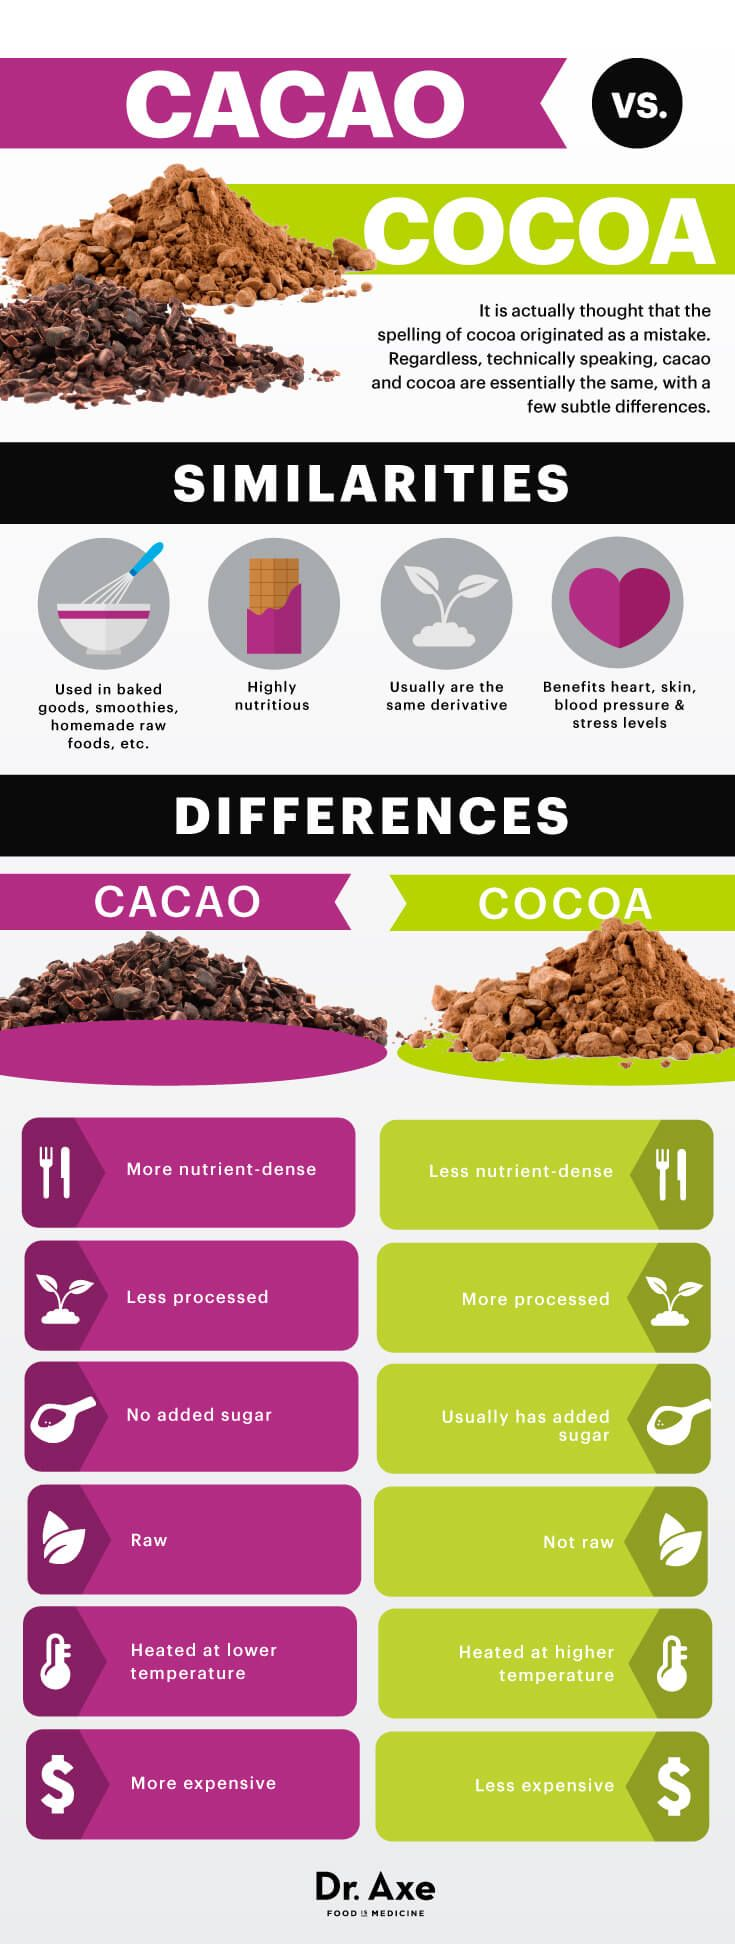 Cacao vs. Cocoa - Dr.Axe http://www.draxe.com #health #Holistic #natural